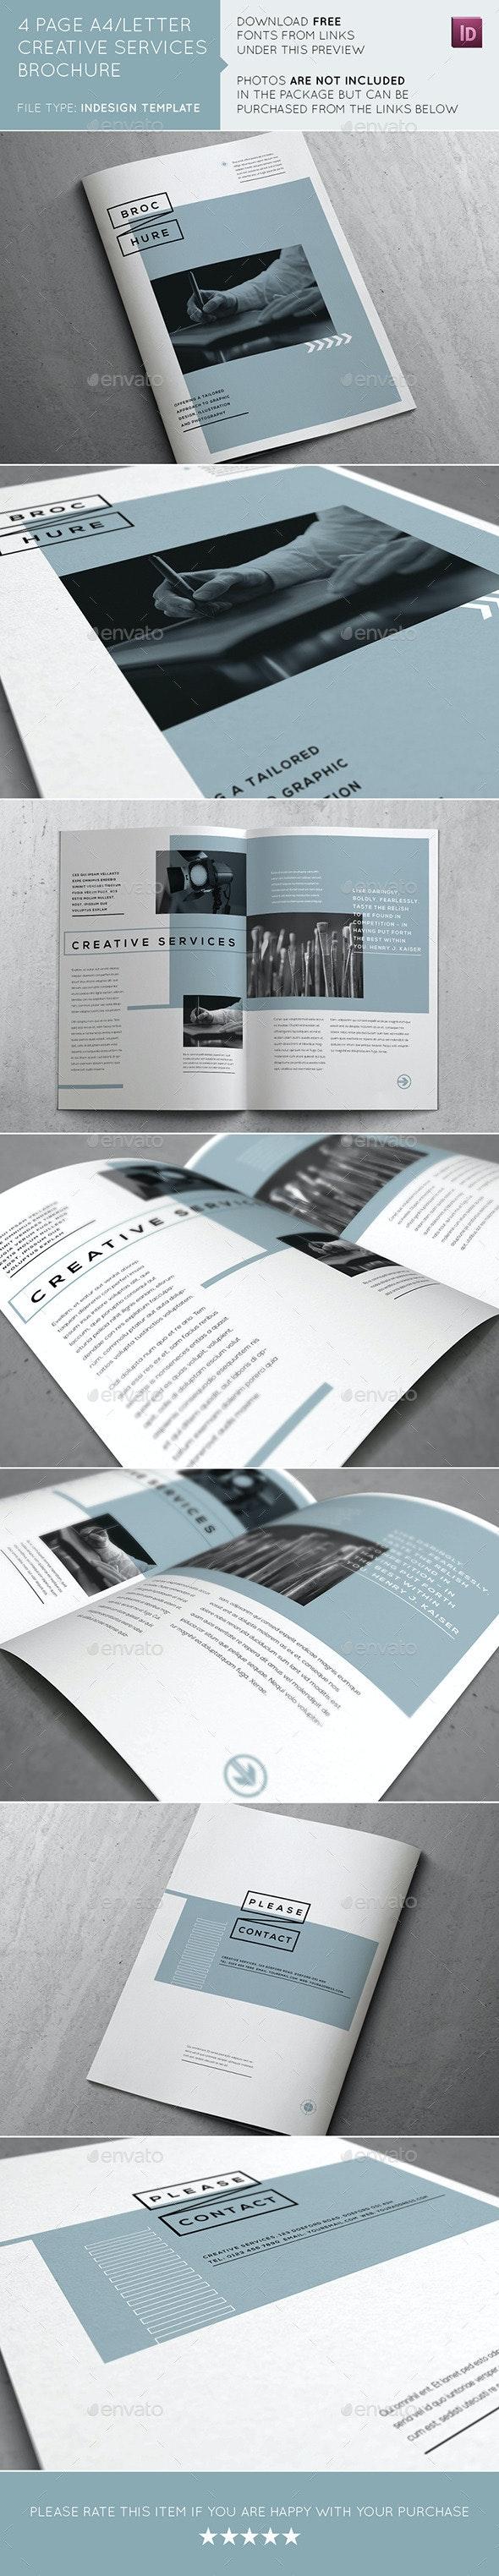 Creative Services Brochure - Brochures Print Templates